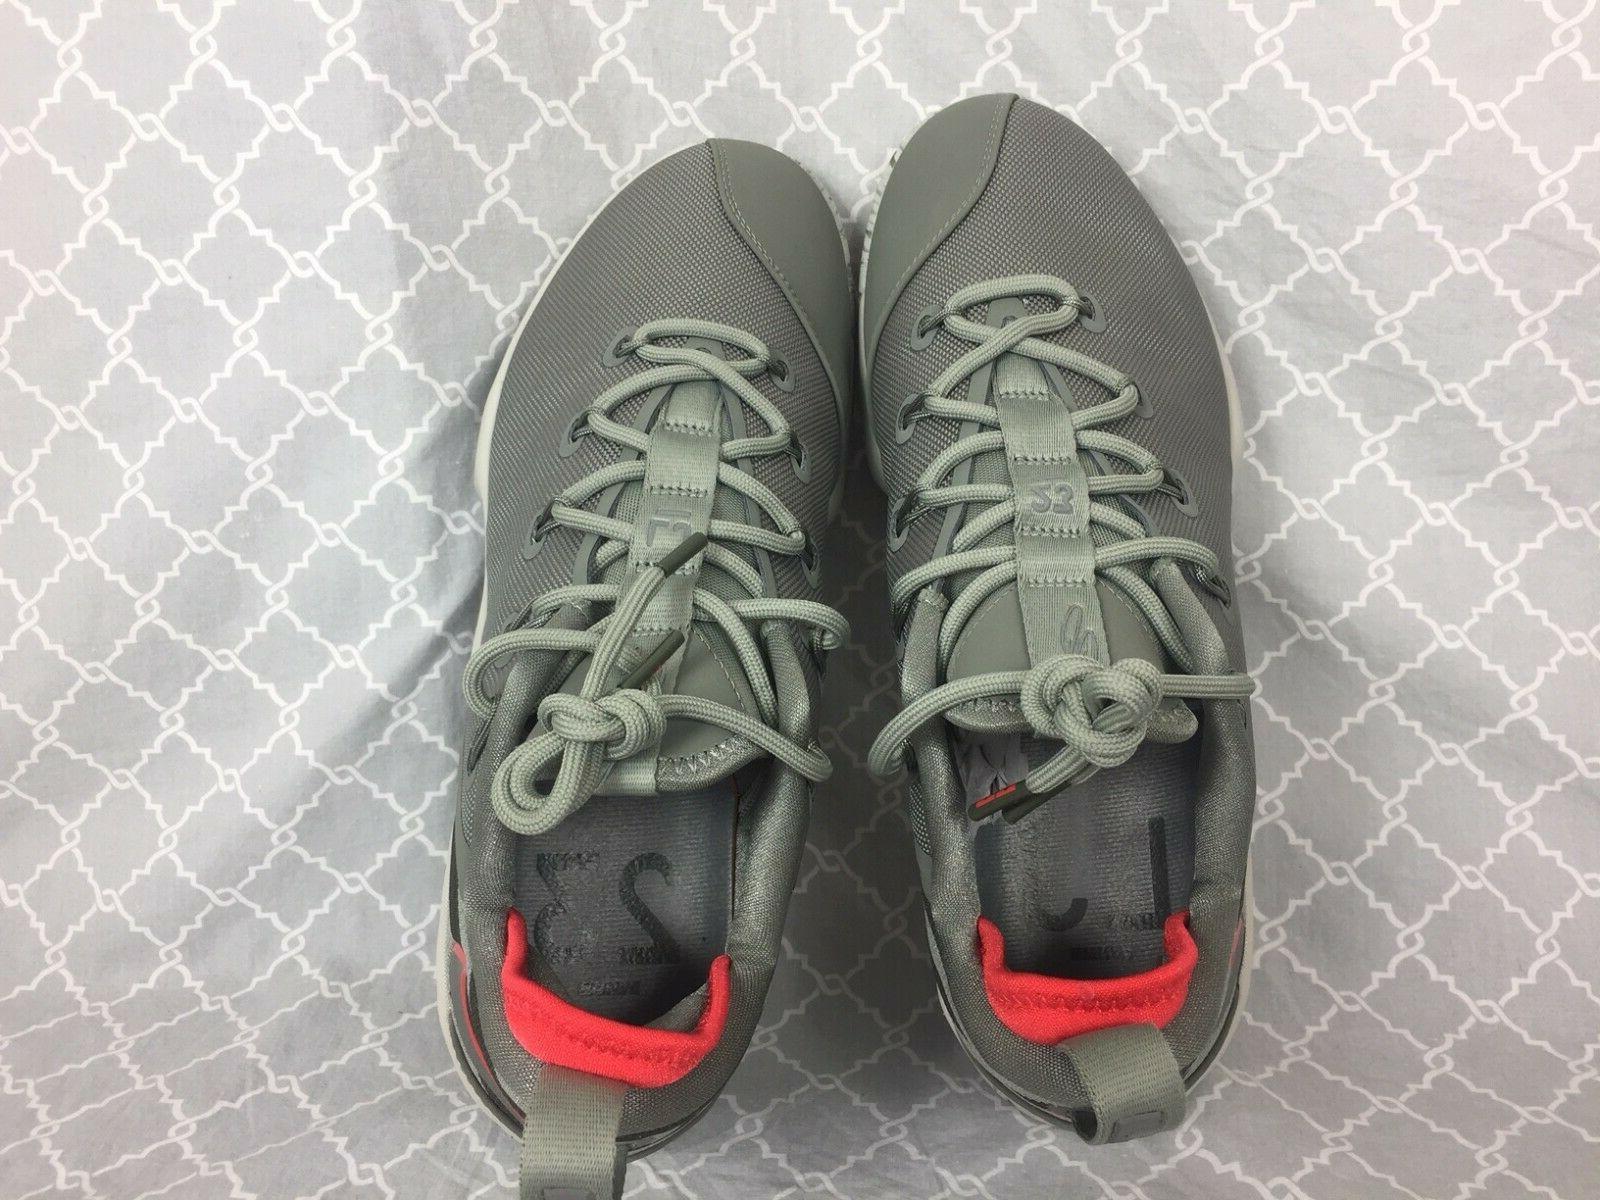 Nike Men's Shoes Stucco